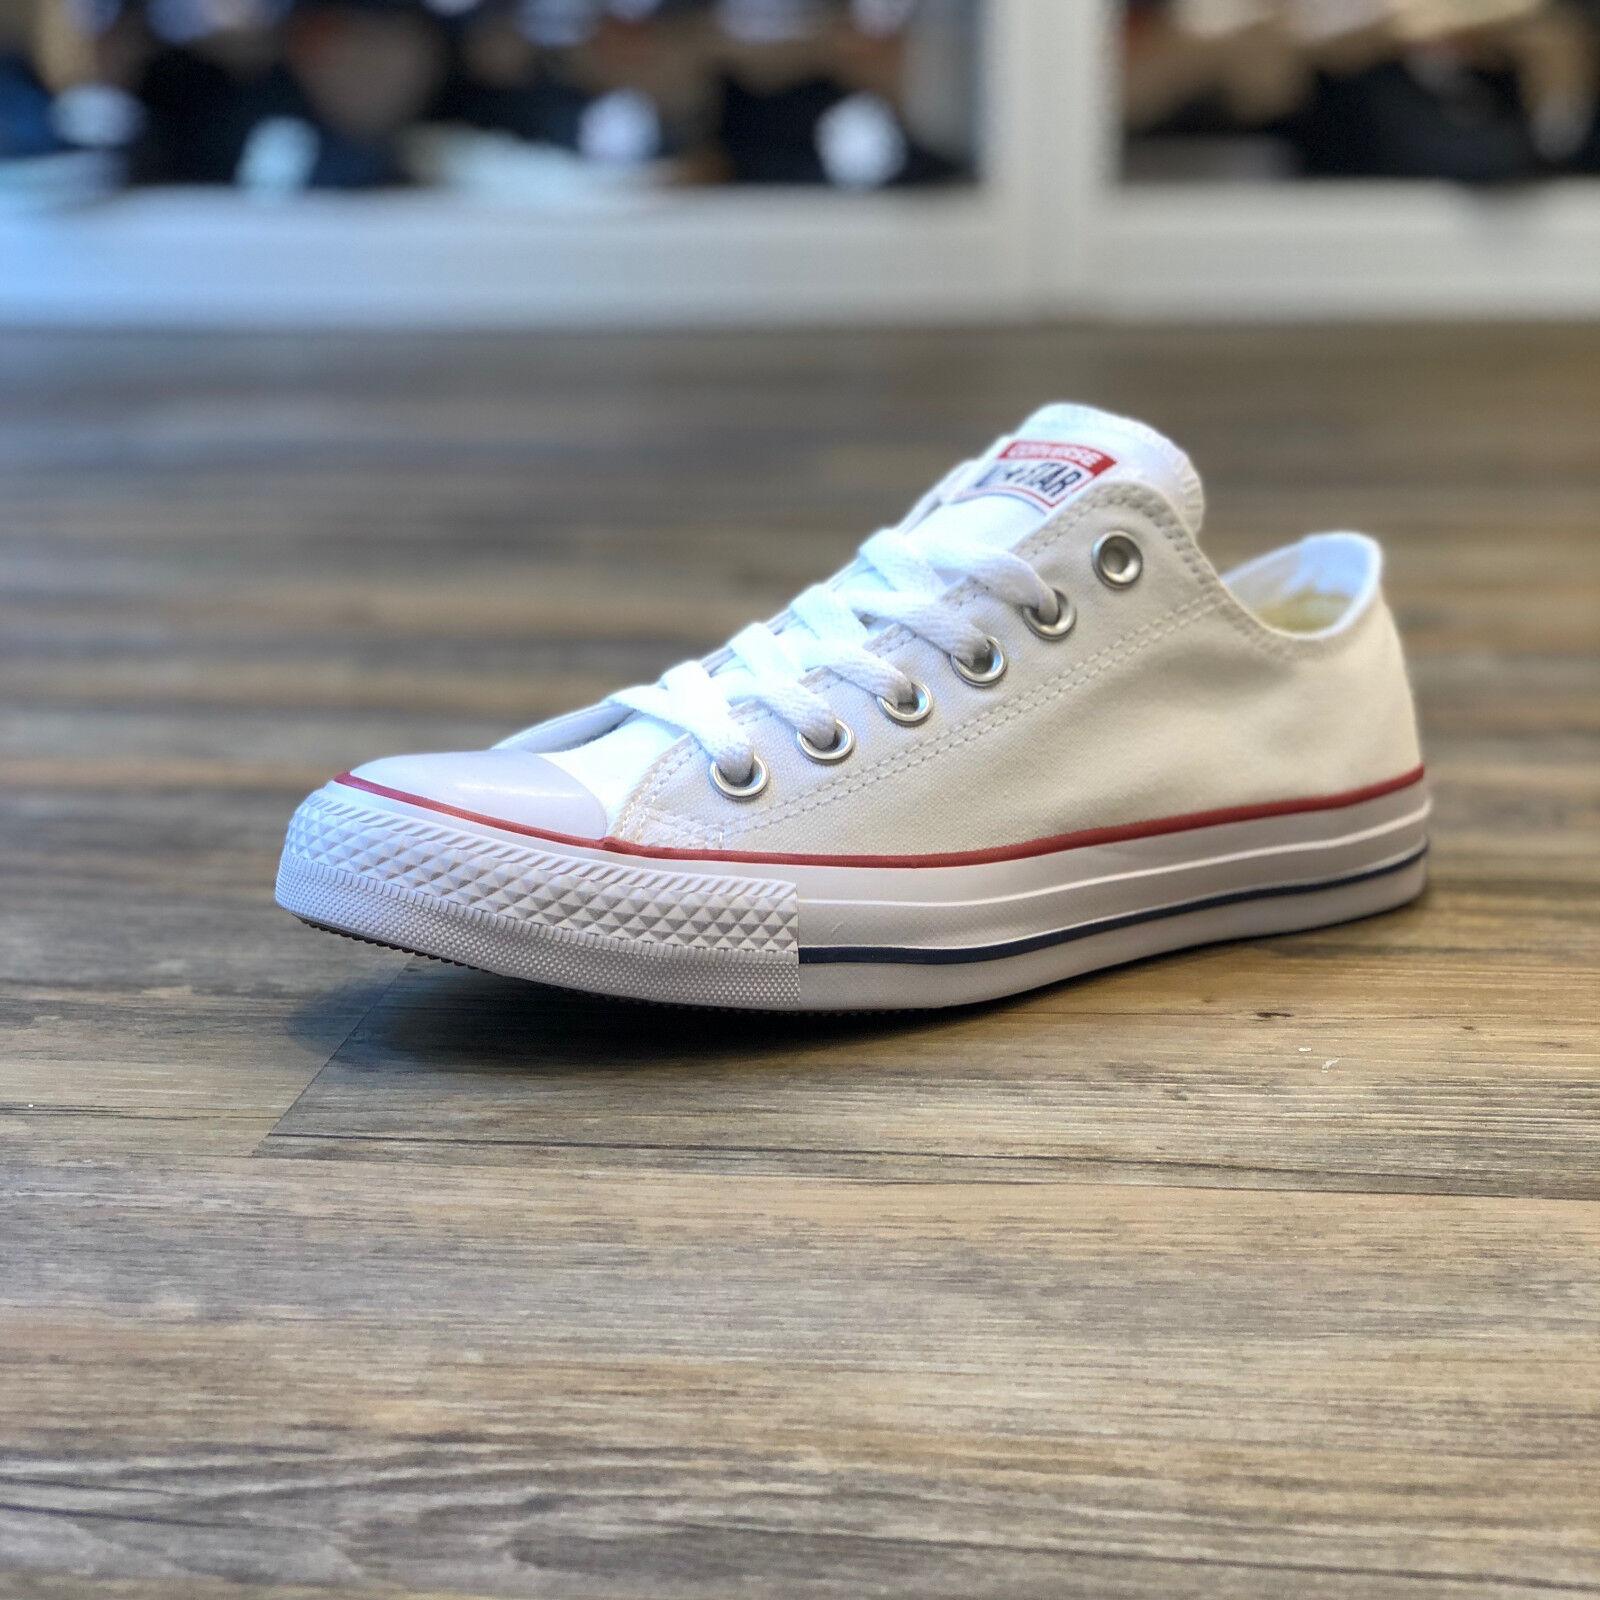 Converse All Star OS Niedrig Gr.36 Gr.36 Niedrig weiß Schuhe Turn Sneaker Herren Damen Neu M7652 fd2a3a